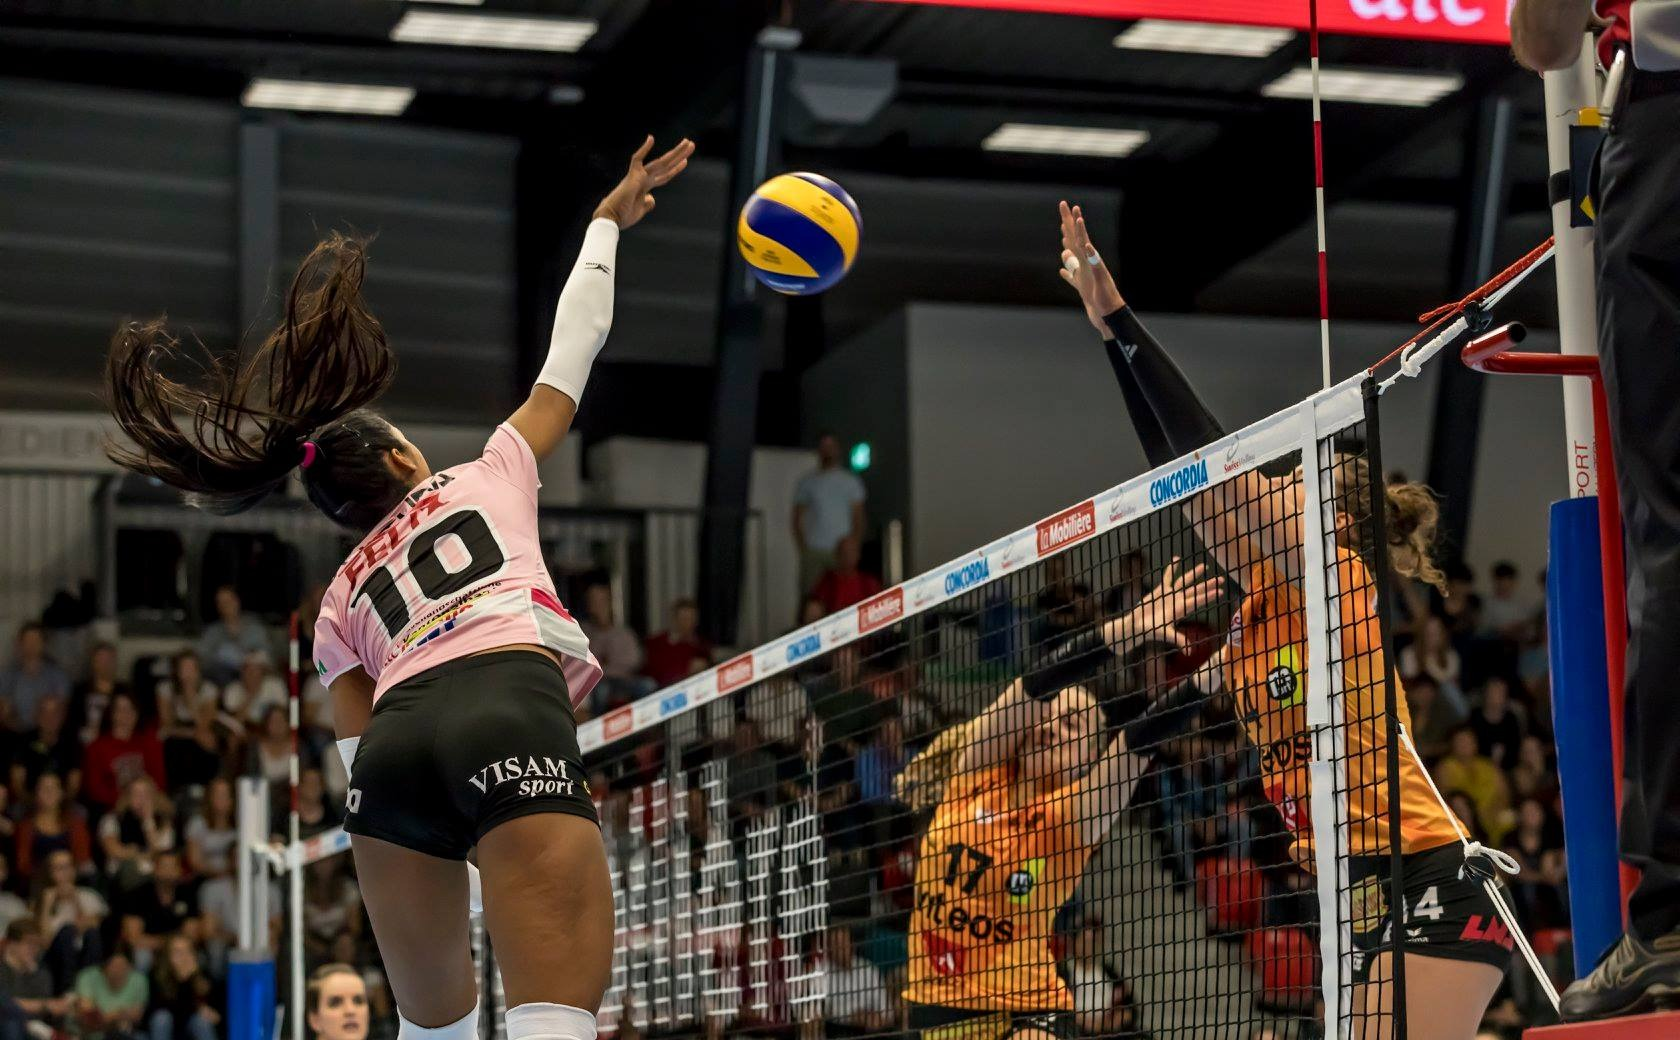 Jessica Ventura_Ynk Sports Agency (4) -